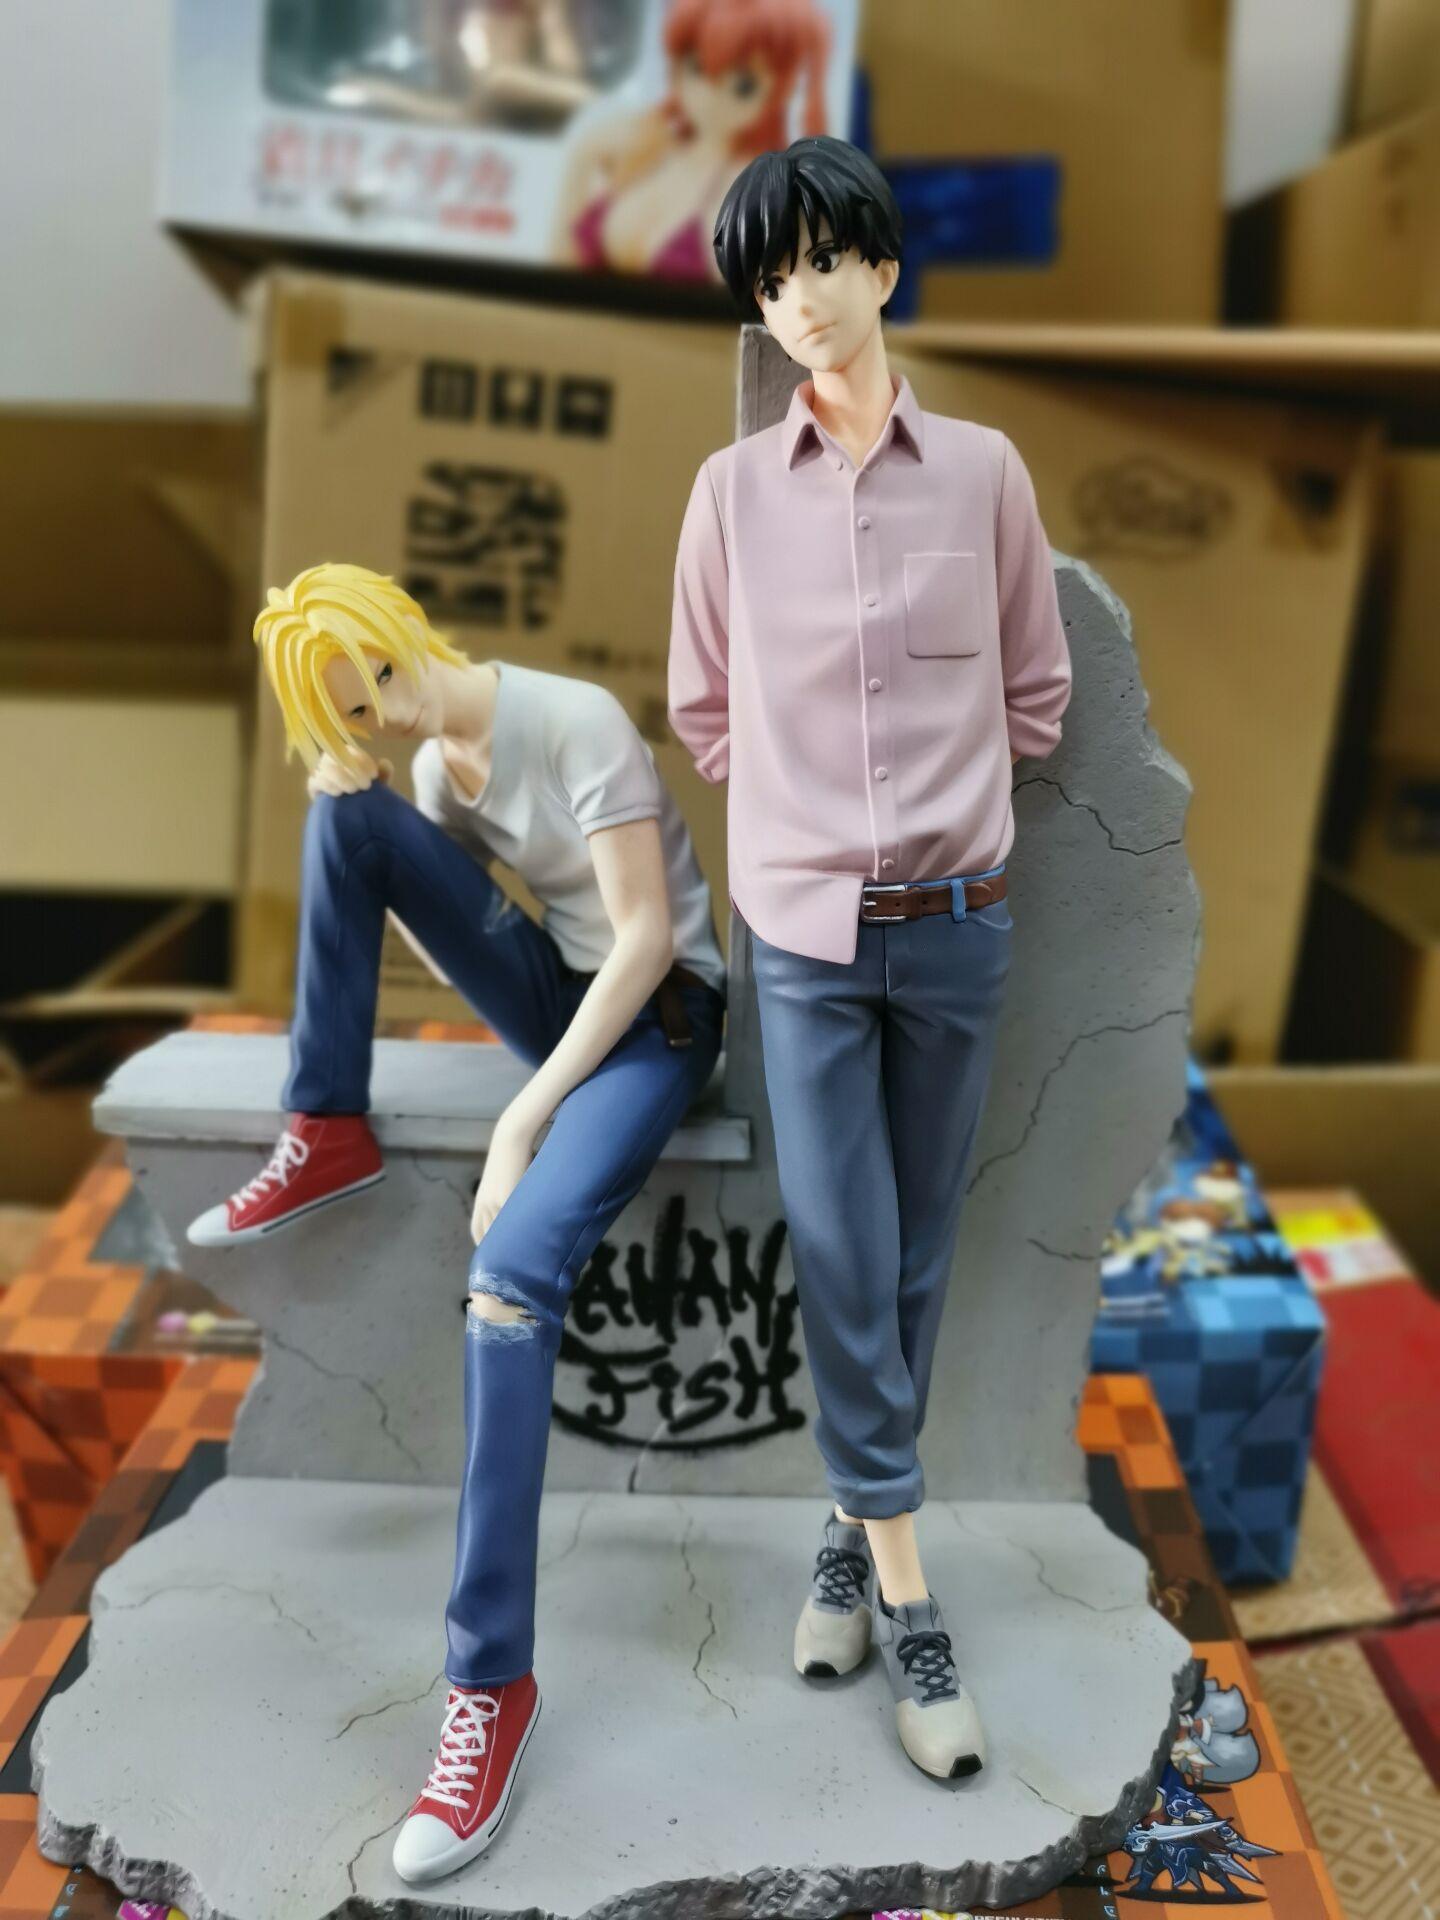 Japanese Original Anime Figure BANANA FISH Aslan Jade Callenreese/Ash Lynx Action Figure Collectible Model Toys For Boys